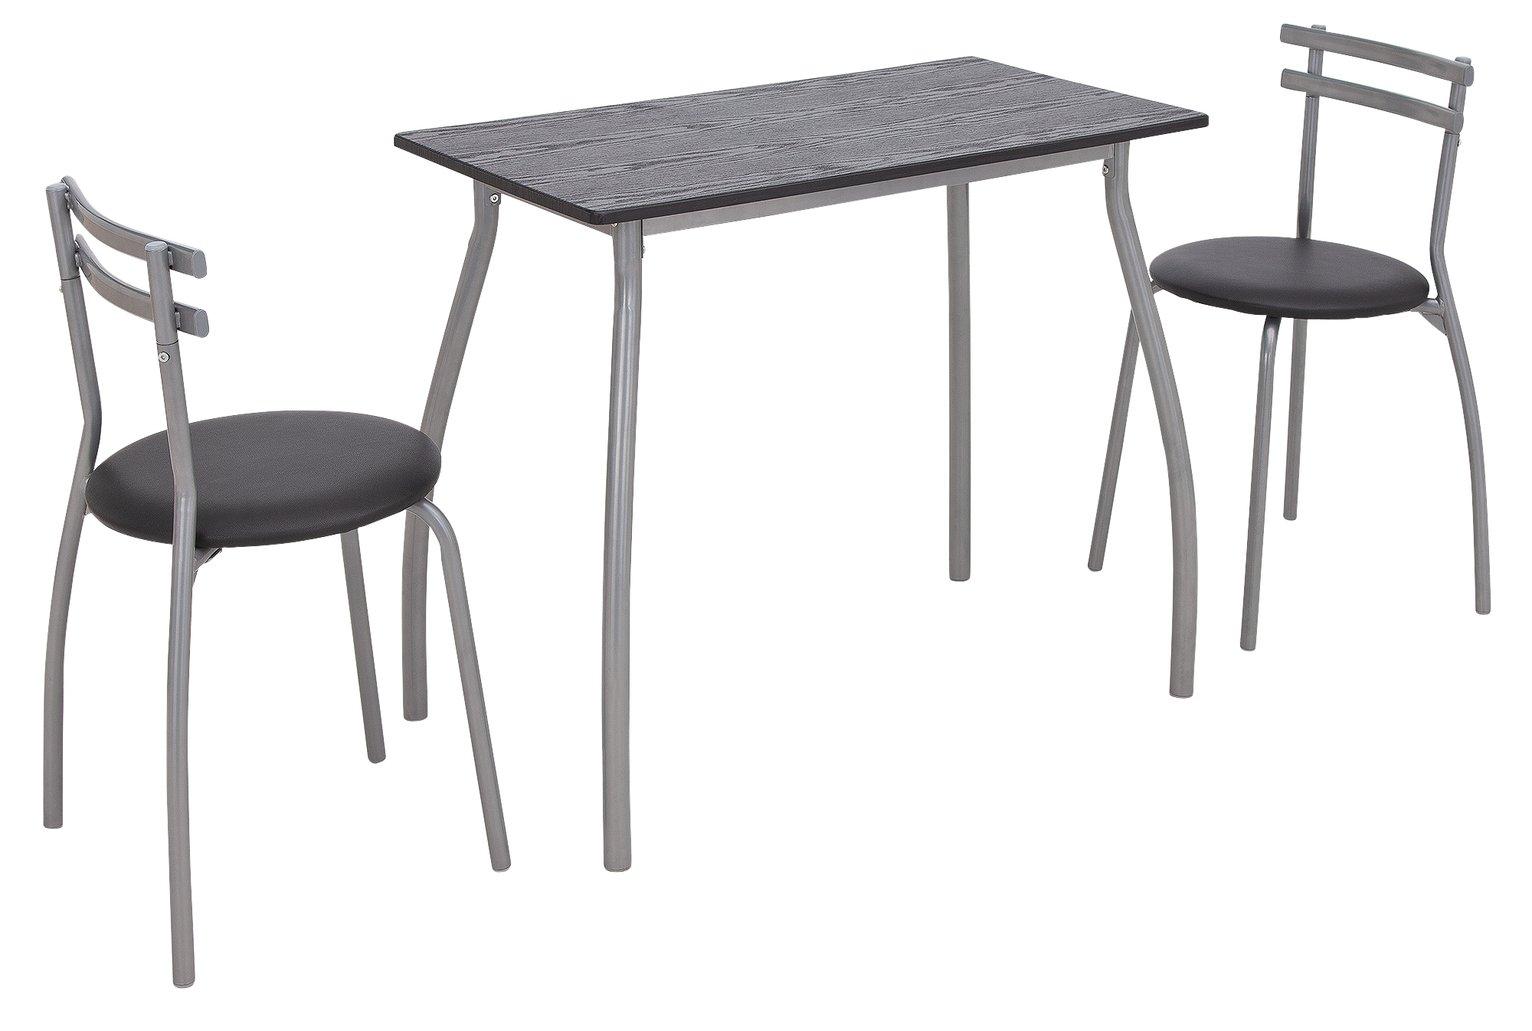 Argos Home Leon Black Table & 2 Black Chairs